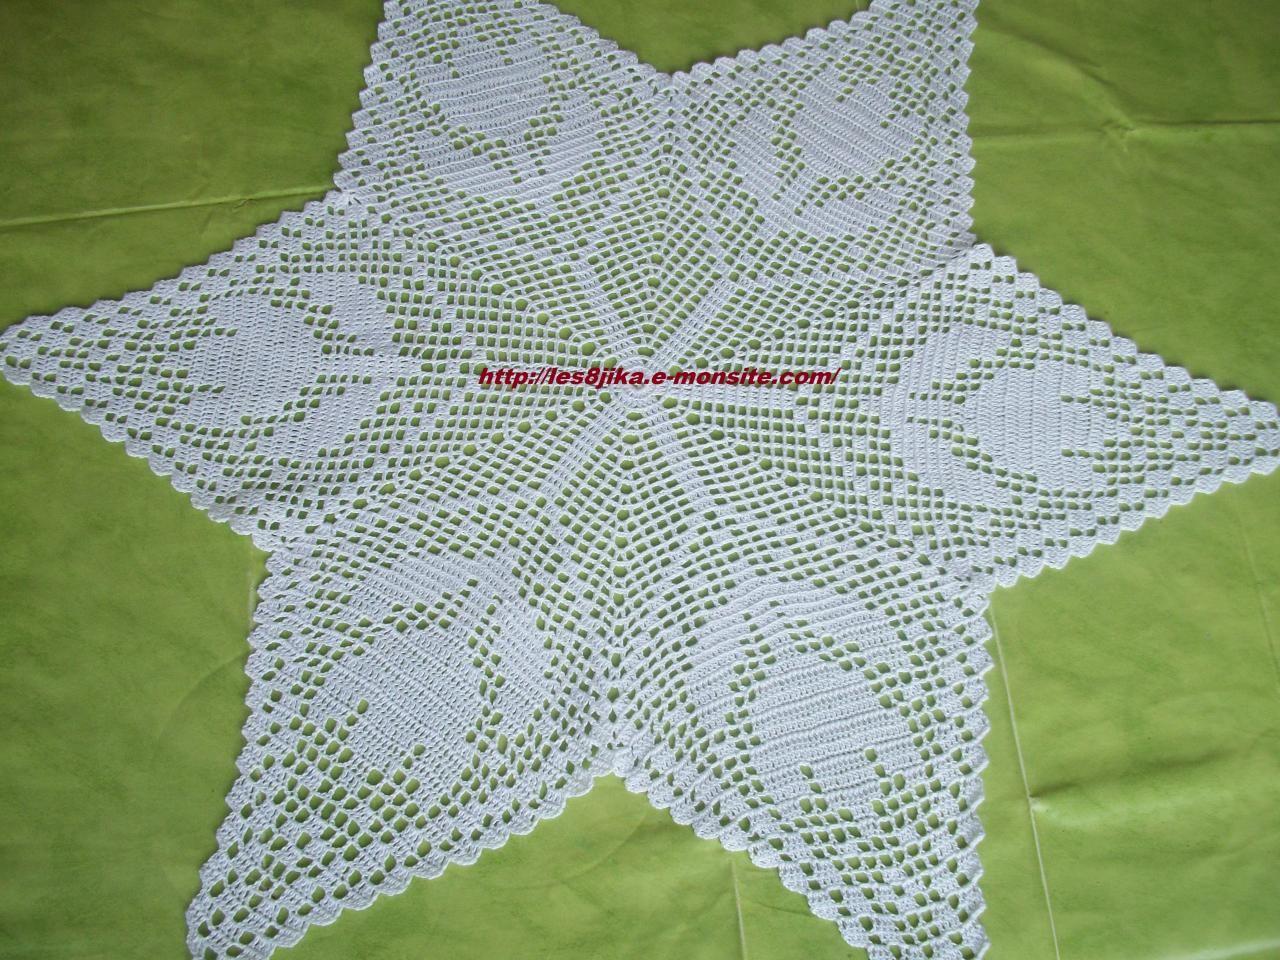 Pin de evelia vega en crochet patrones | Pinterest | Tapetes en ...